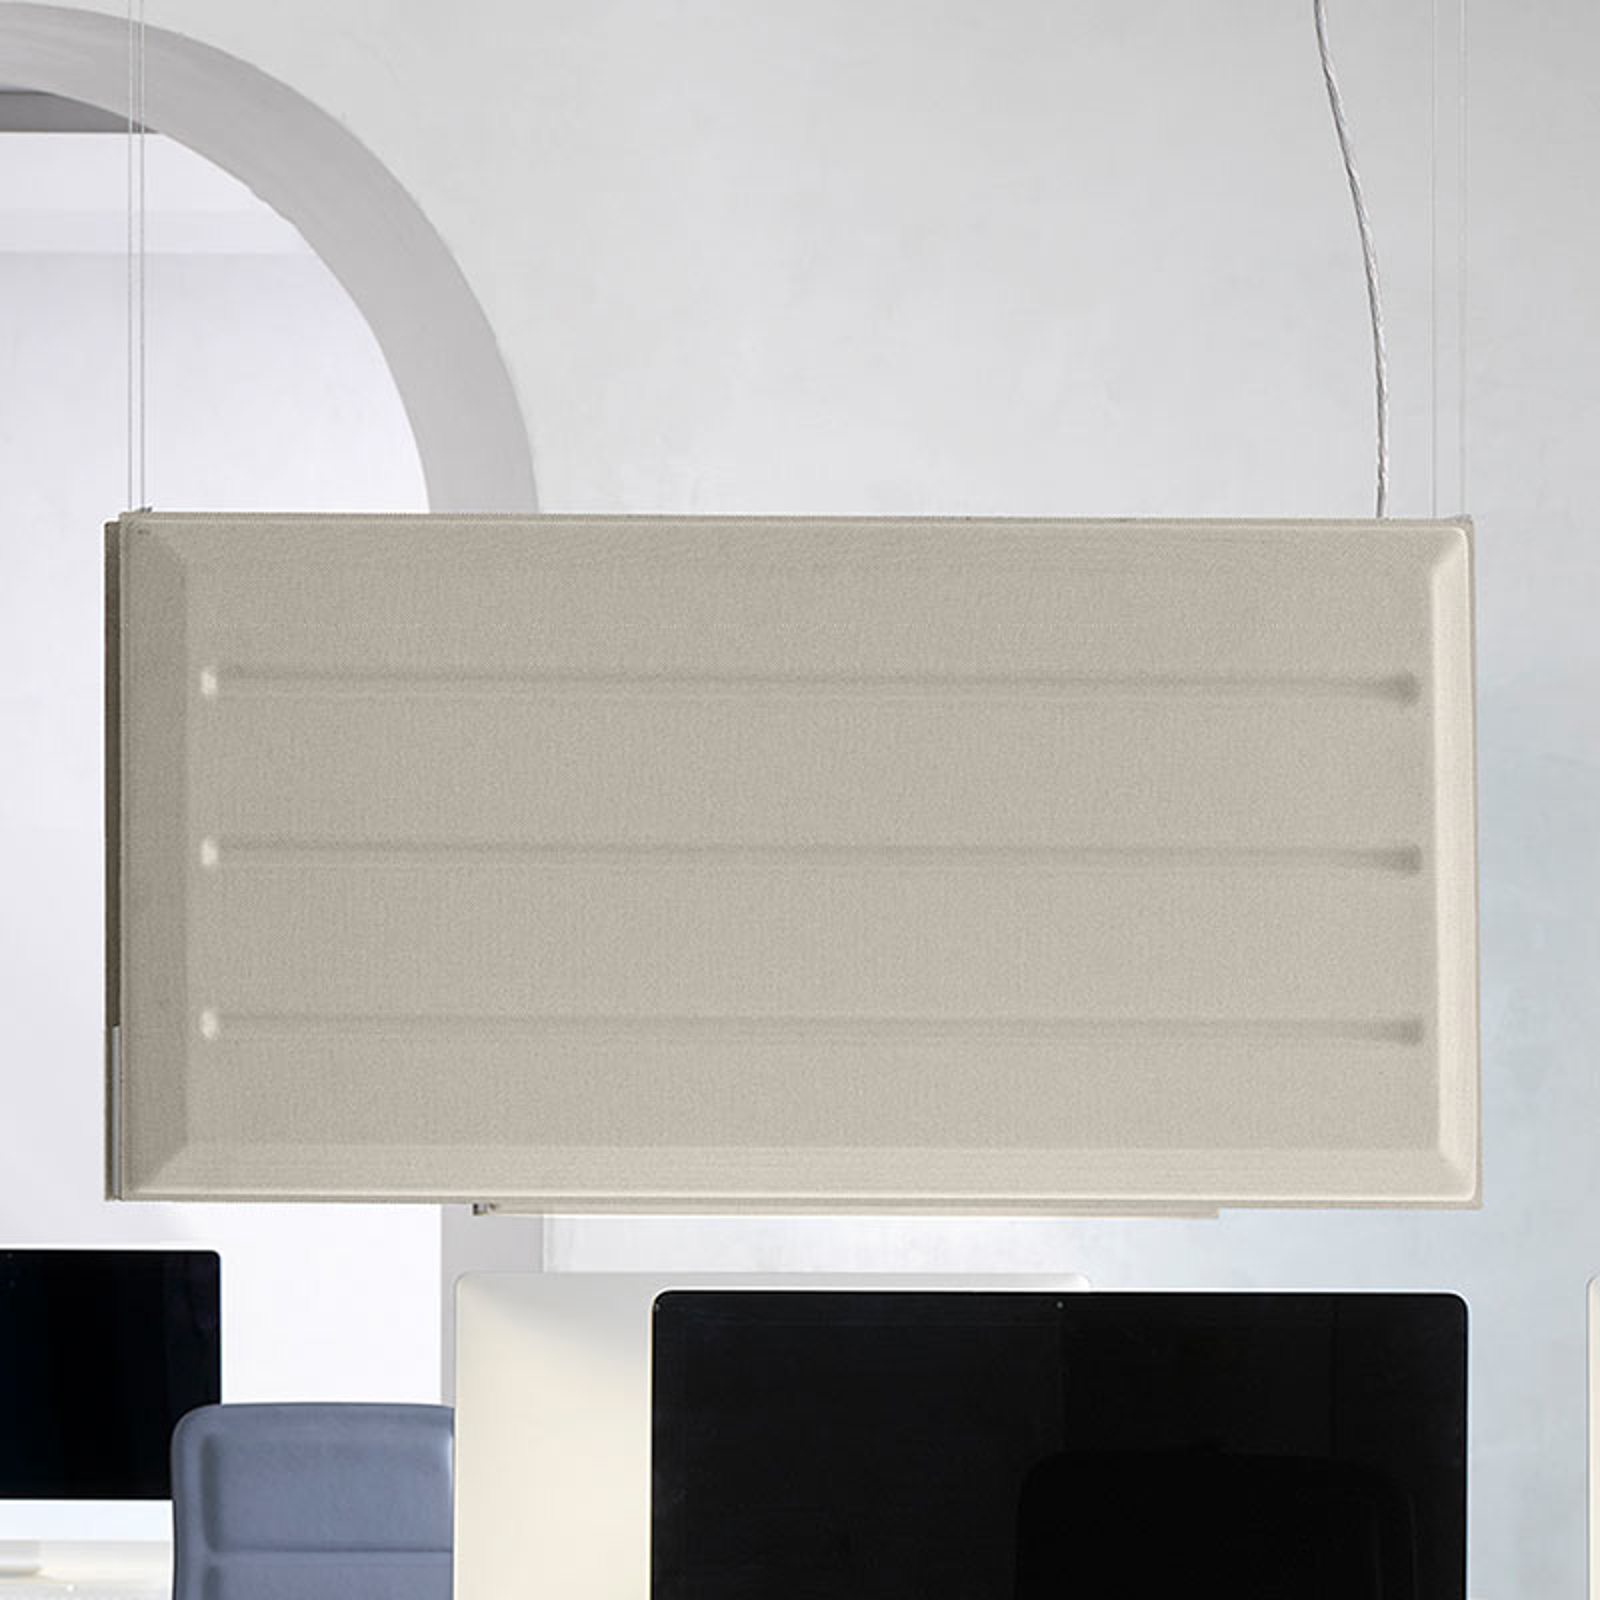 Luceplan Diade LED-hengelampe vertikal beige 120cm